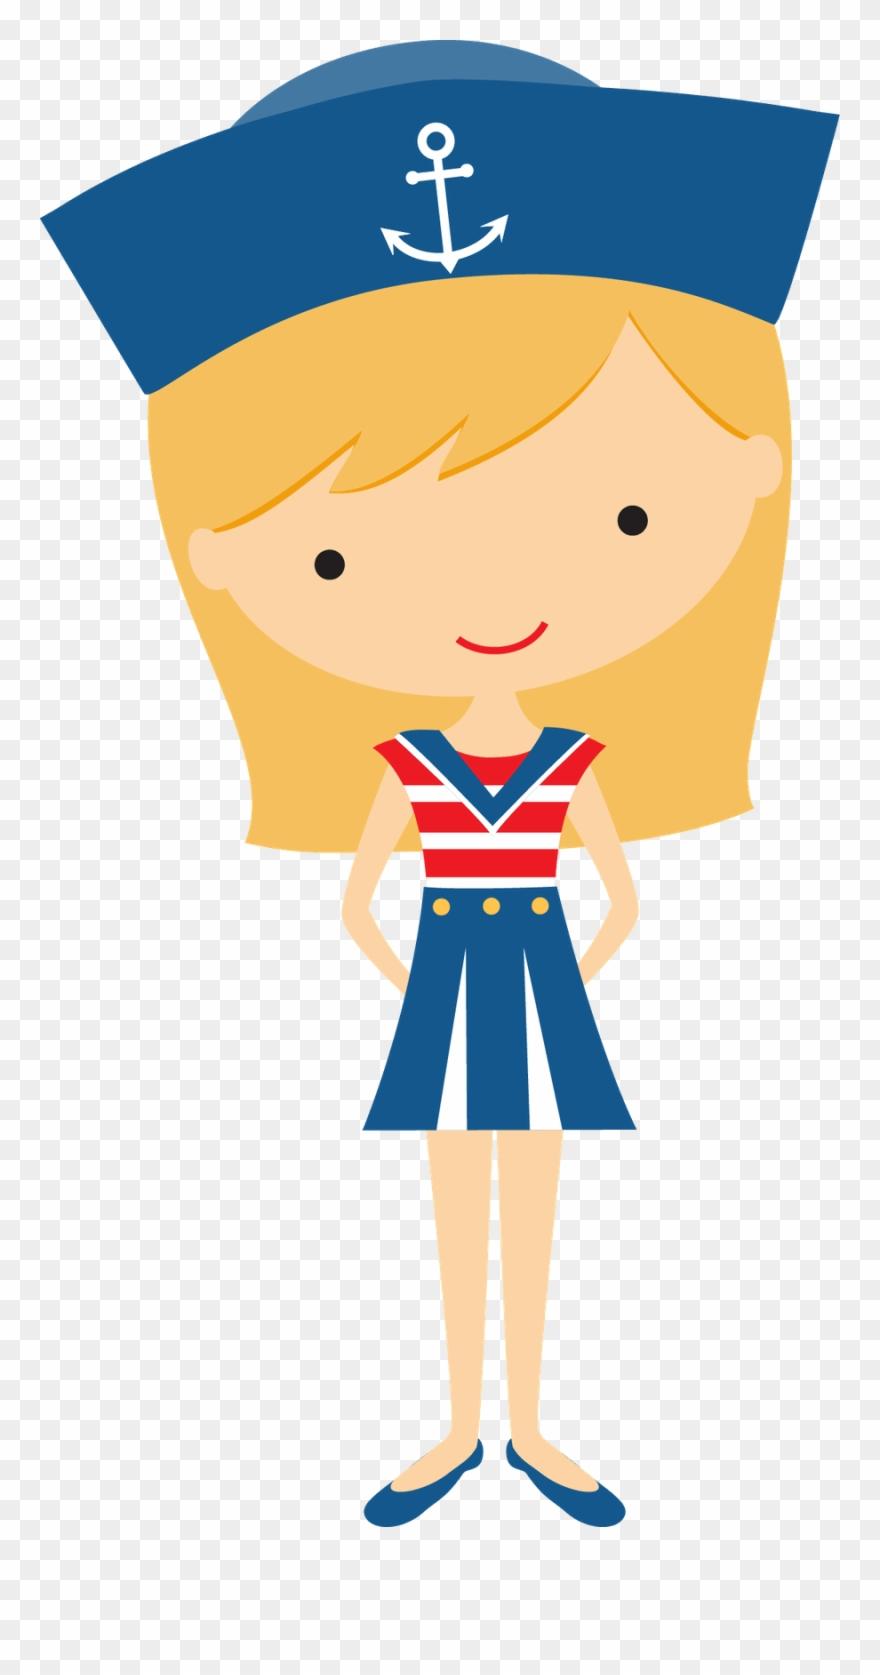 Sailor clipart clip stock Sailor Girl Clip Art - Nautical Theme Hats Clipart - Png ... clip stock